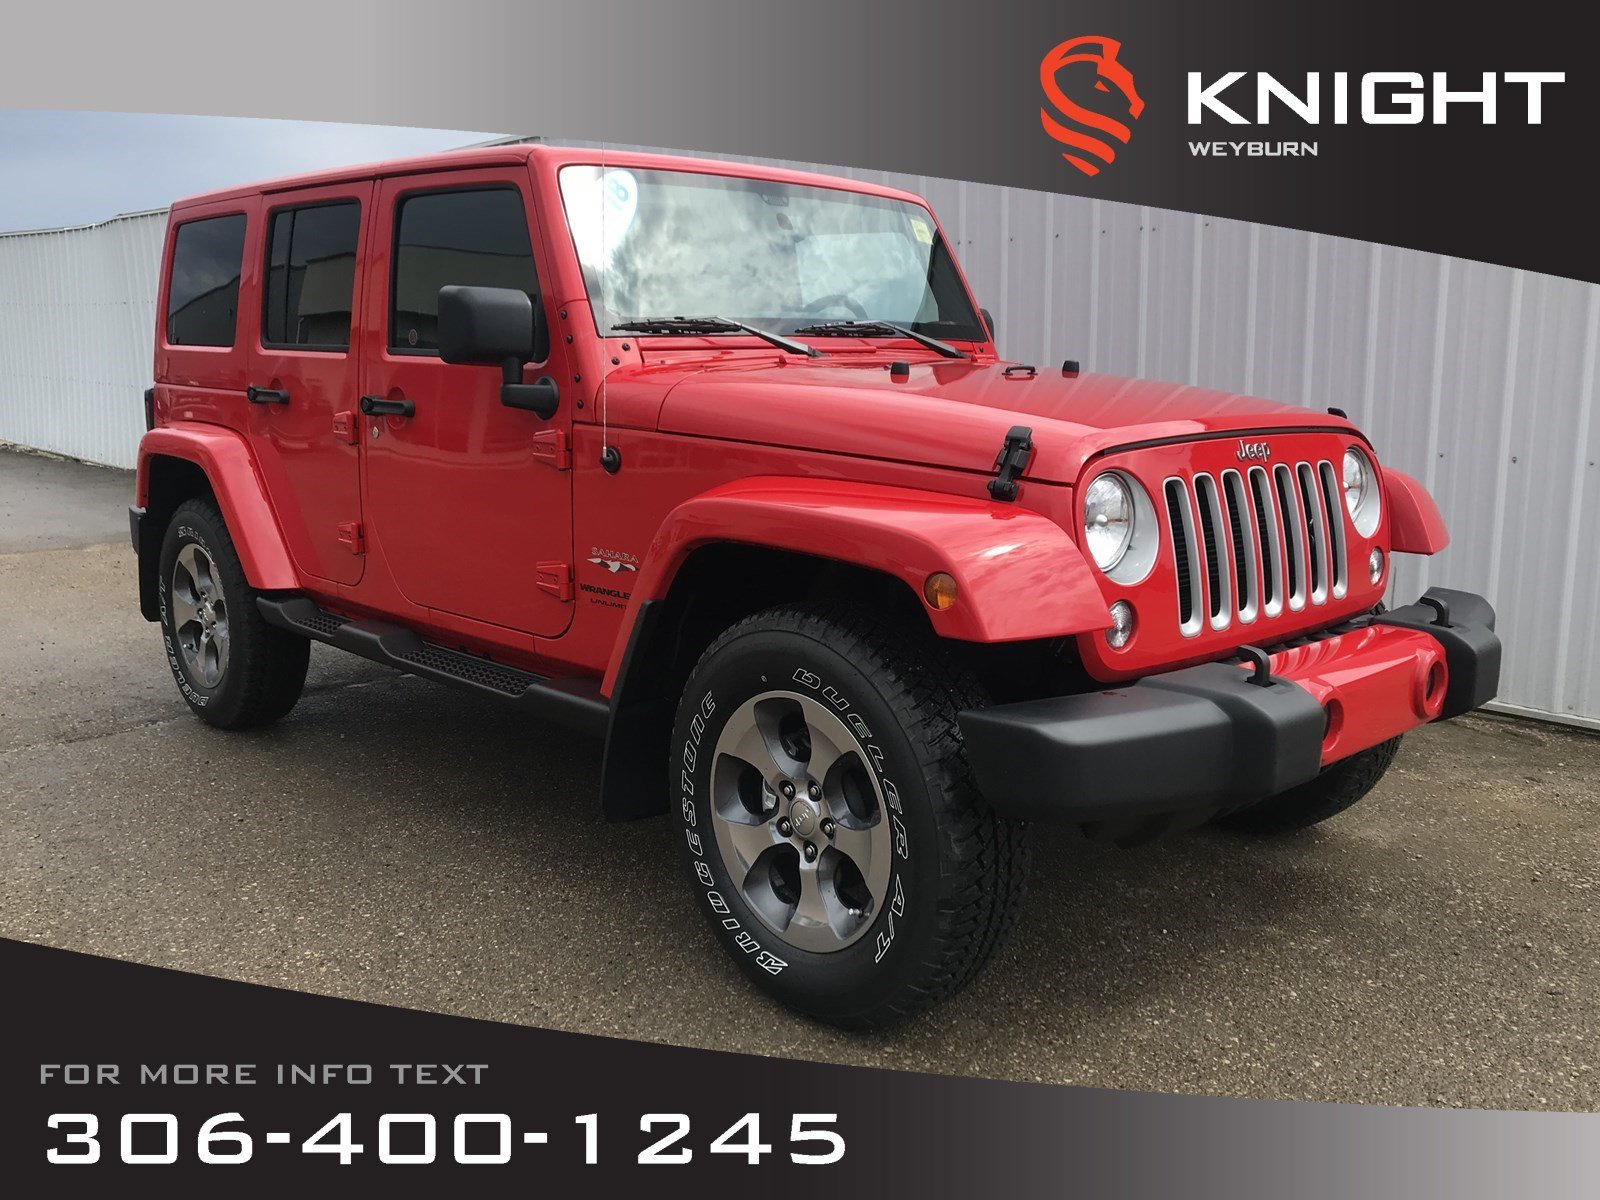 Featured | Knight Weyburn Chrysler Dodge Jeep Ram